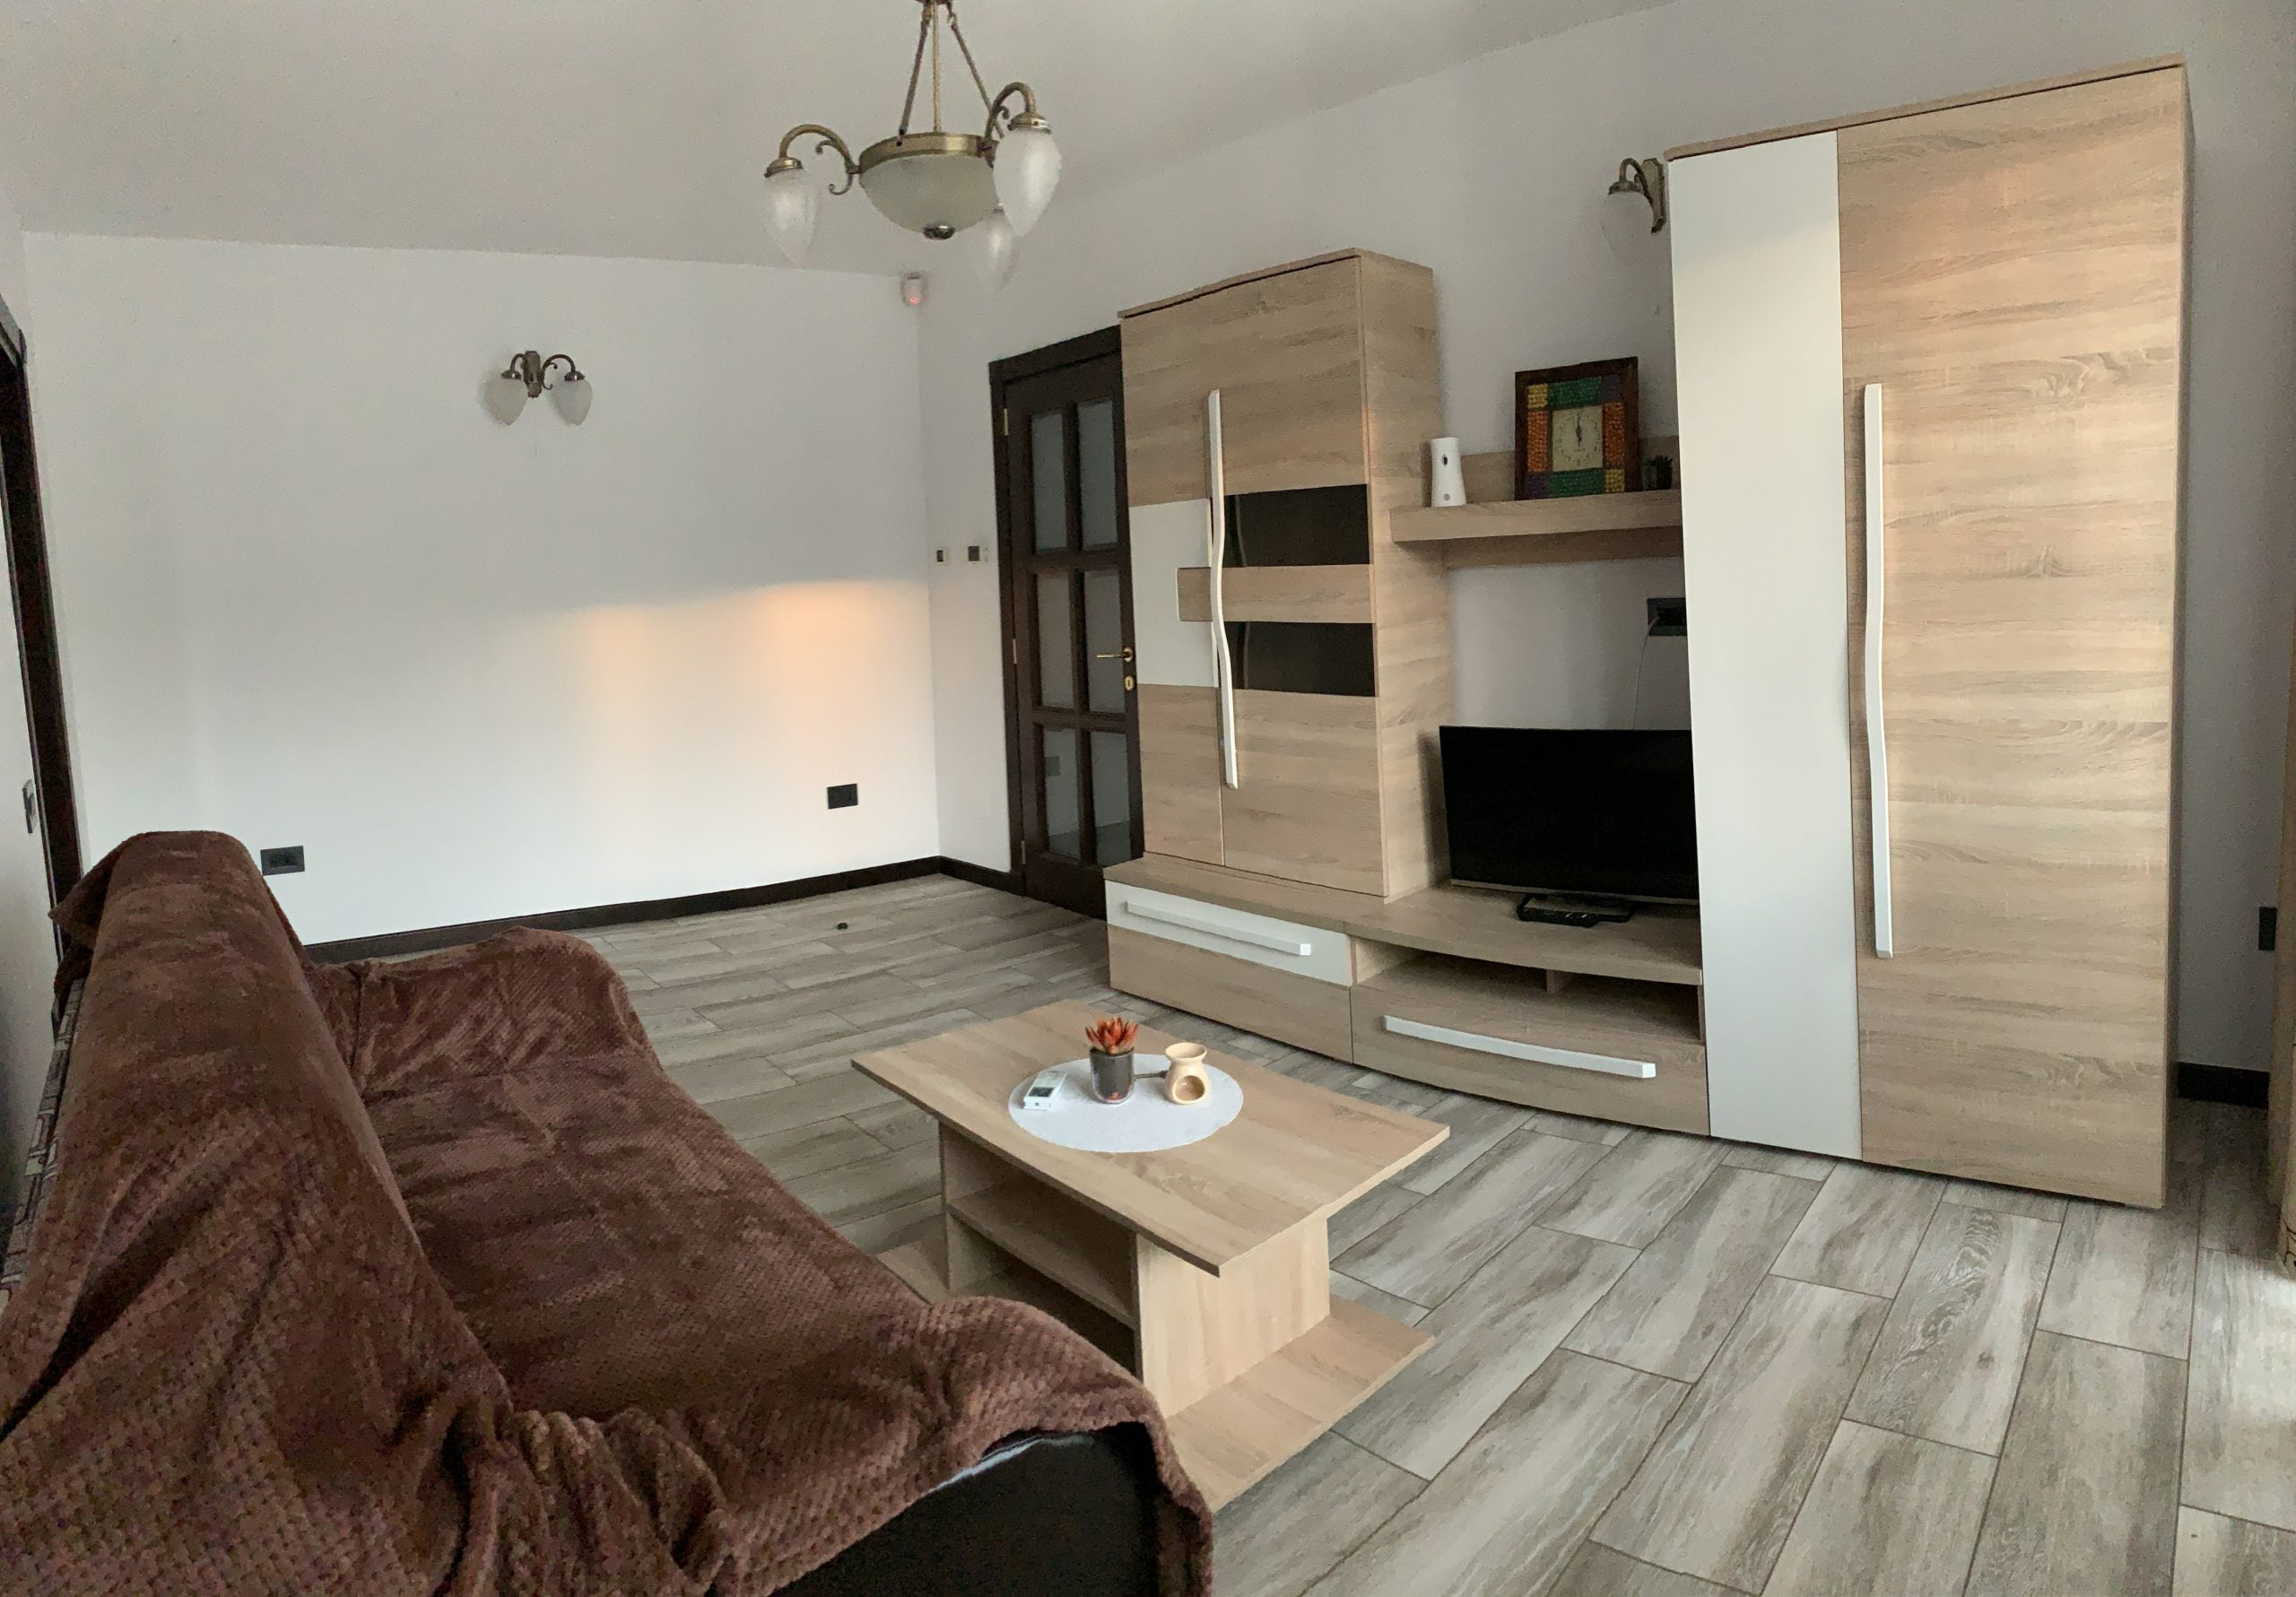 Apartament 3 camere decomandat, finisat, Cetate zona Spital, etajul 3